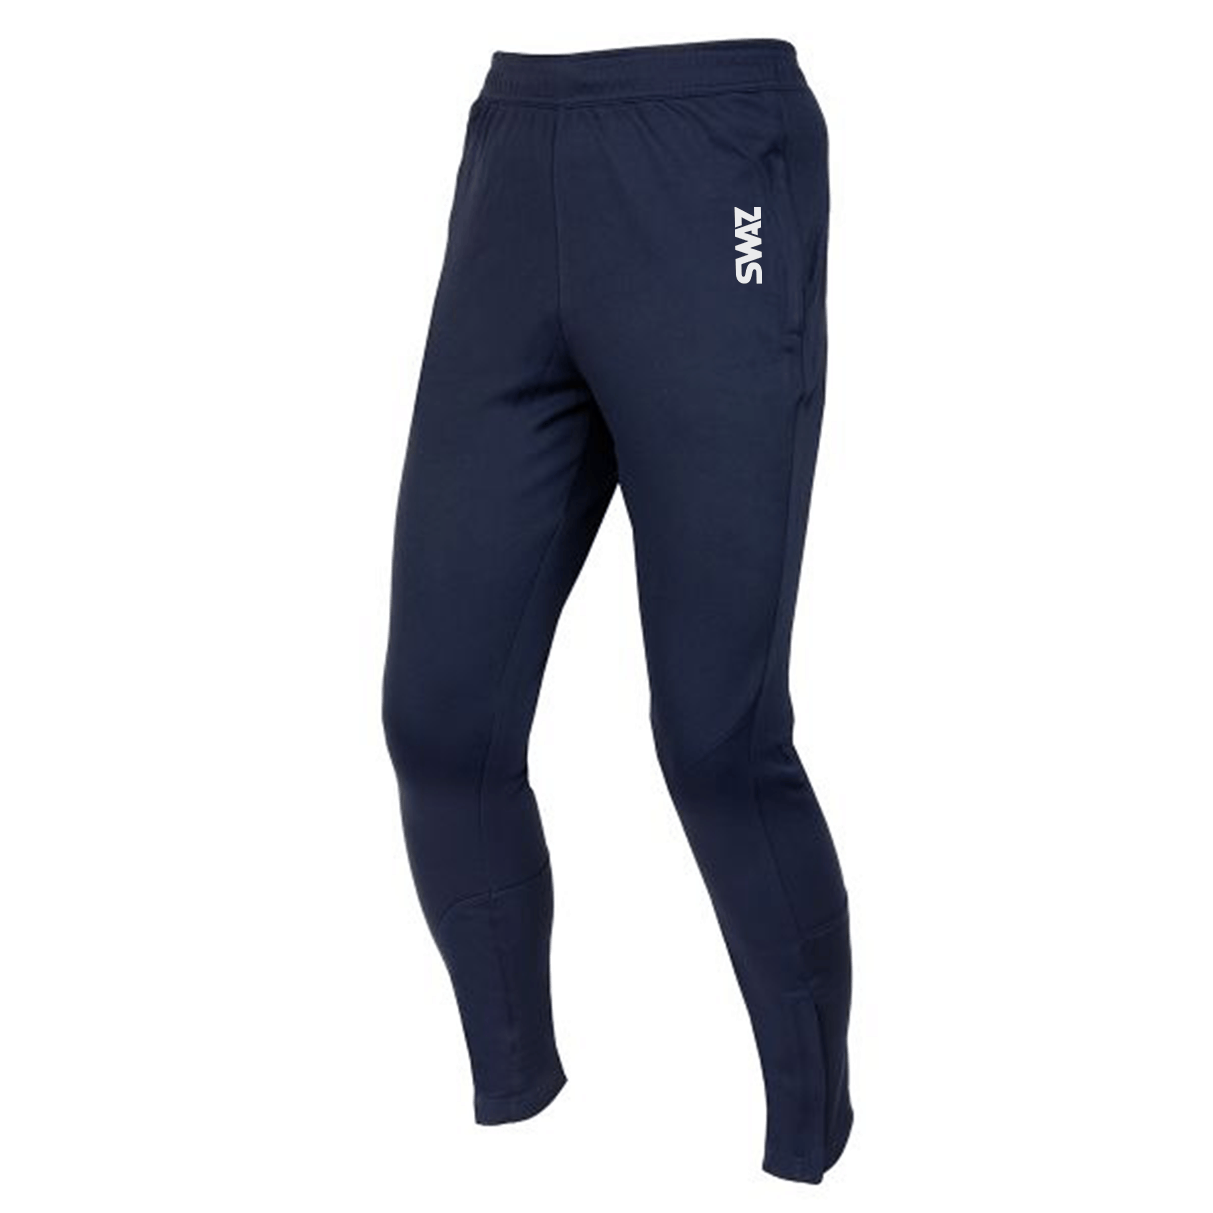 SWAZ Navy Skinny Pants   Football Teamwear